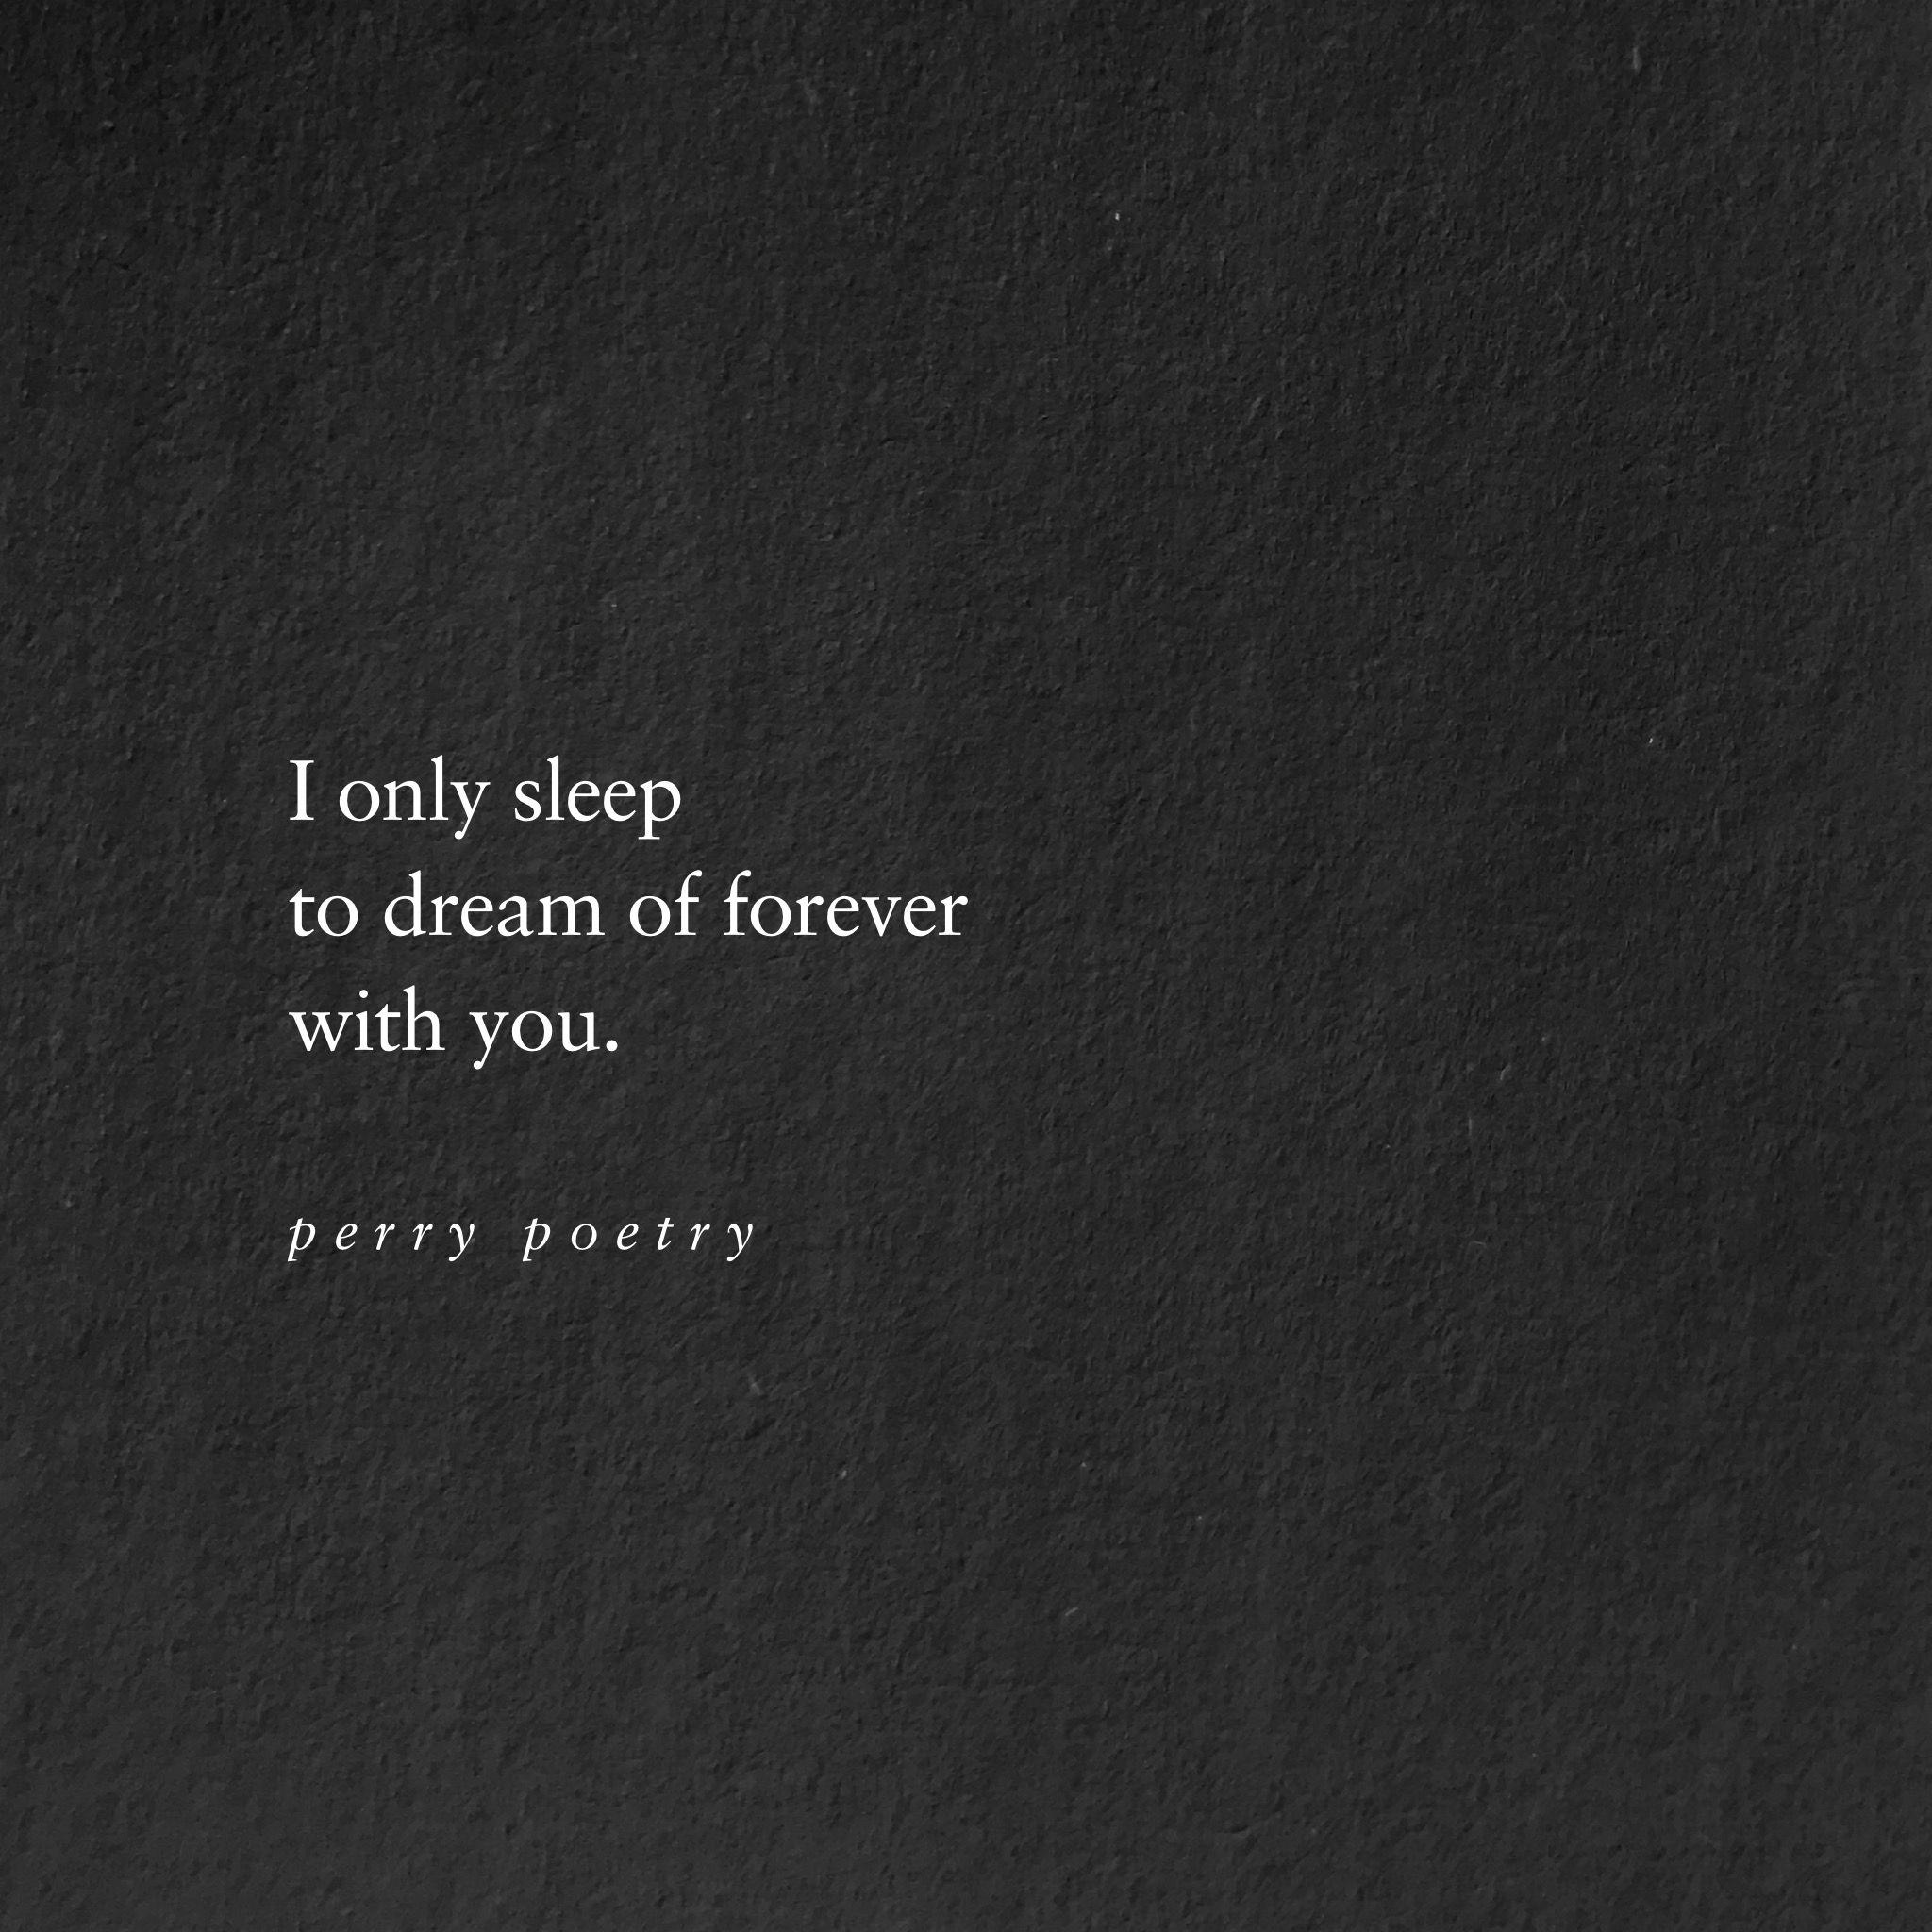 I sleep to dream?